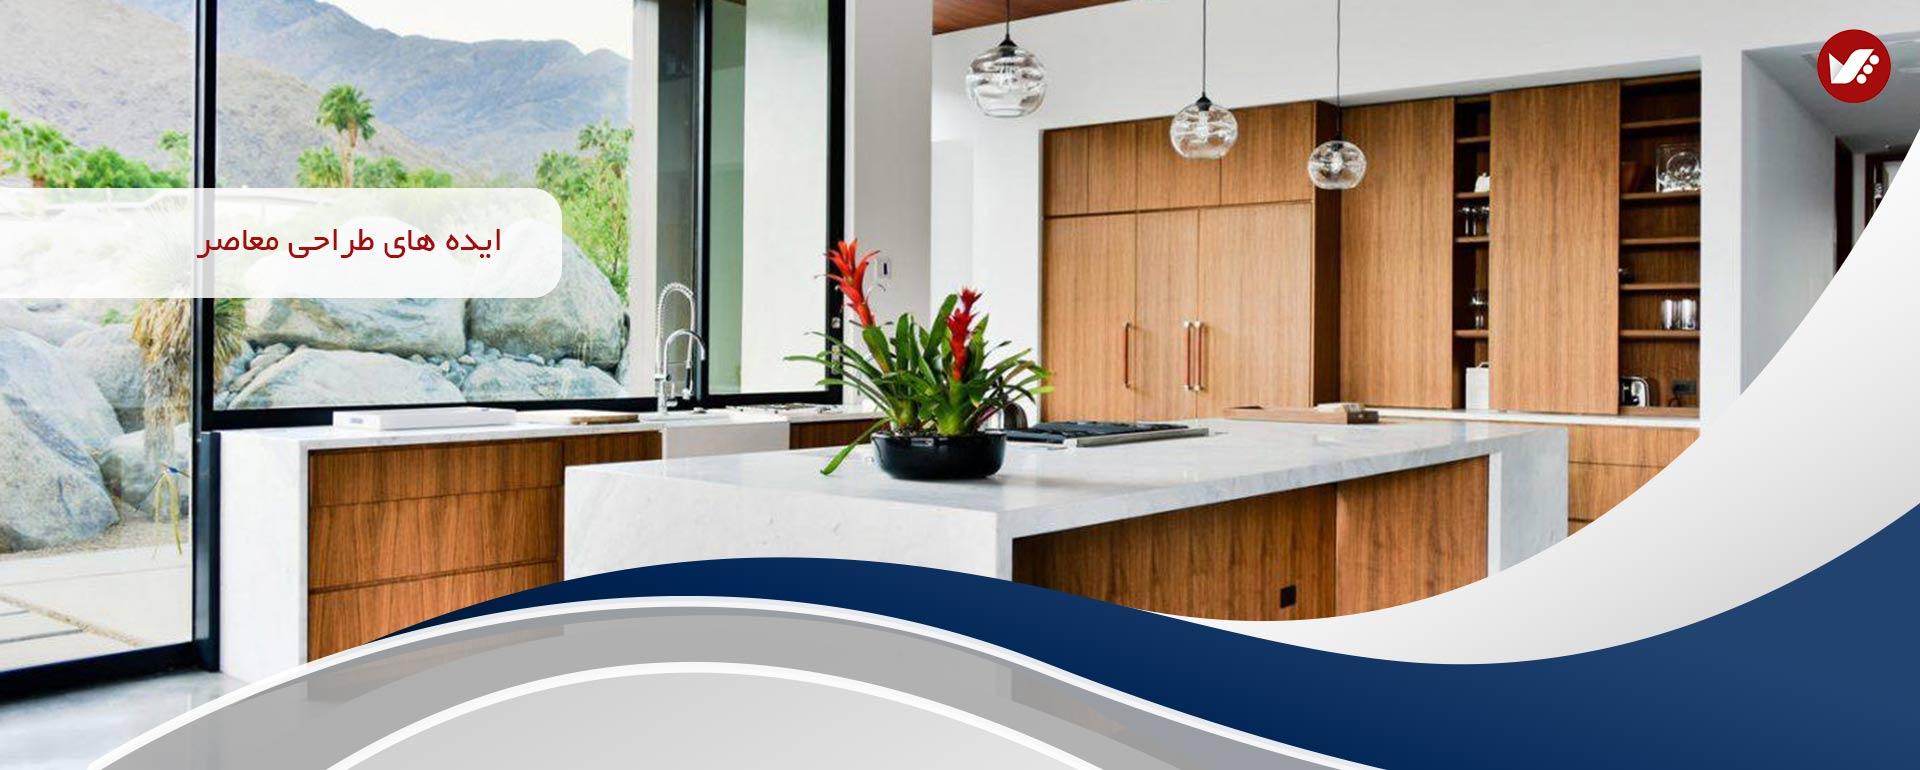 contemporary interior design banner - ایده های طراحی معاصر